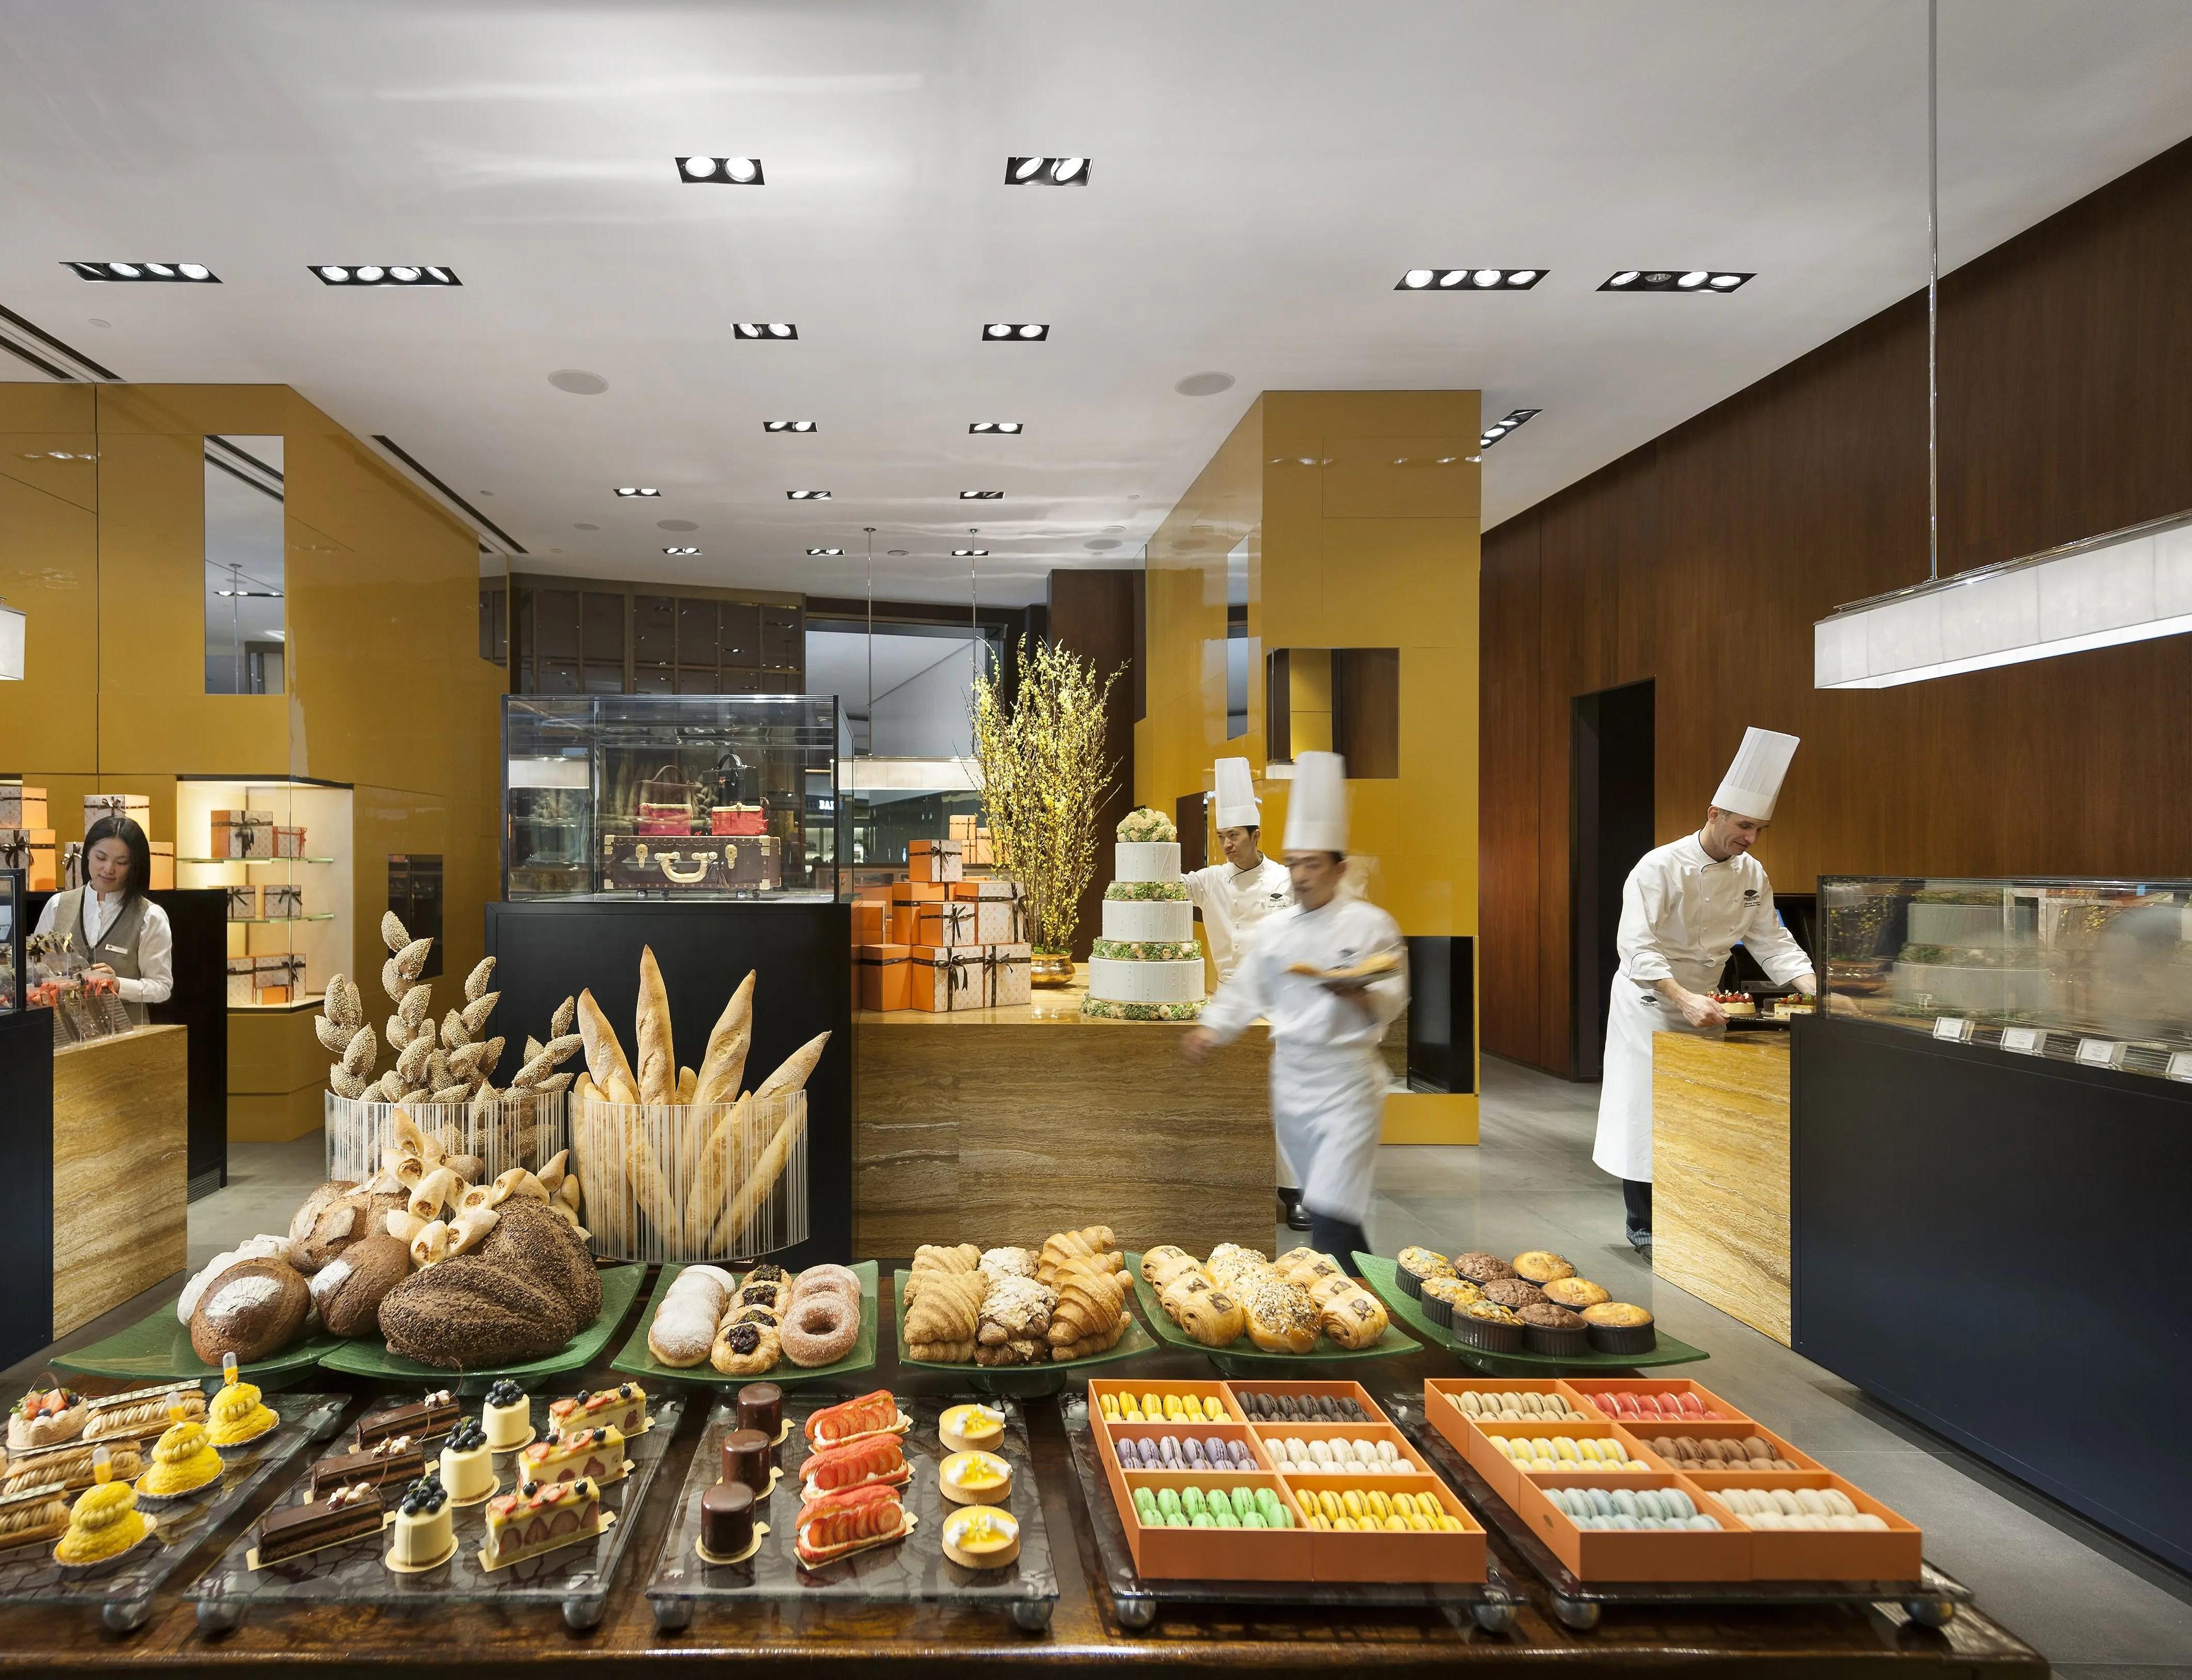 Mandarin Cake - Shops In Tianhe